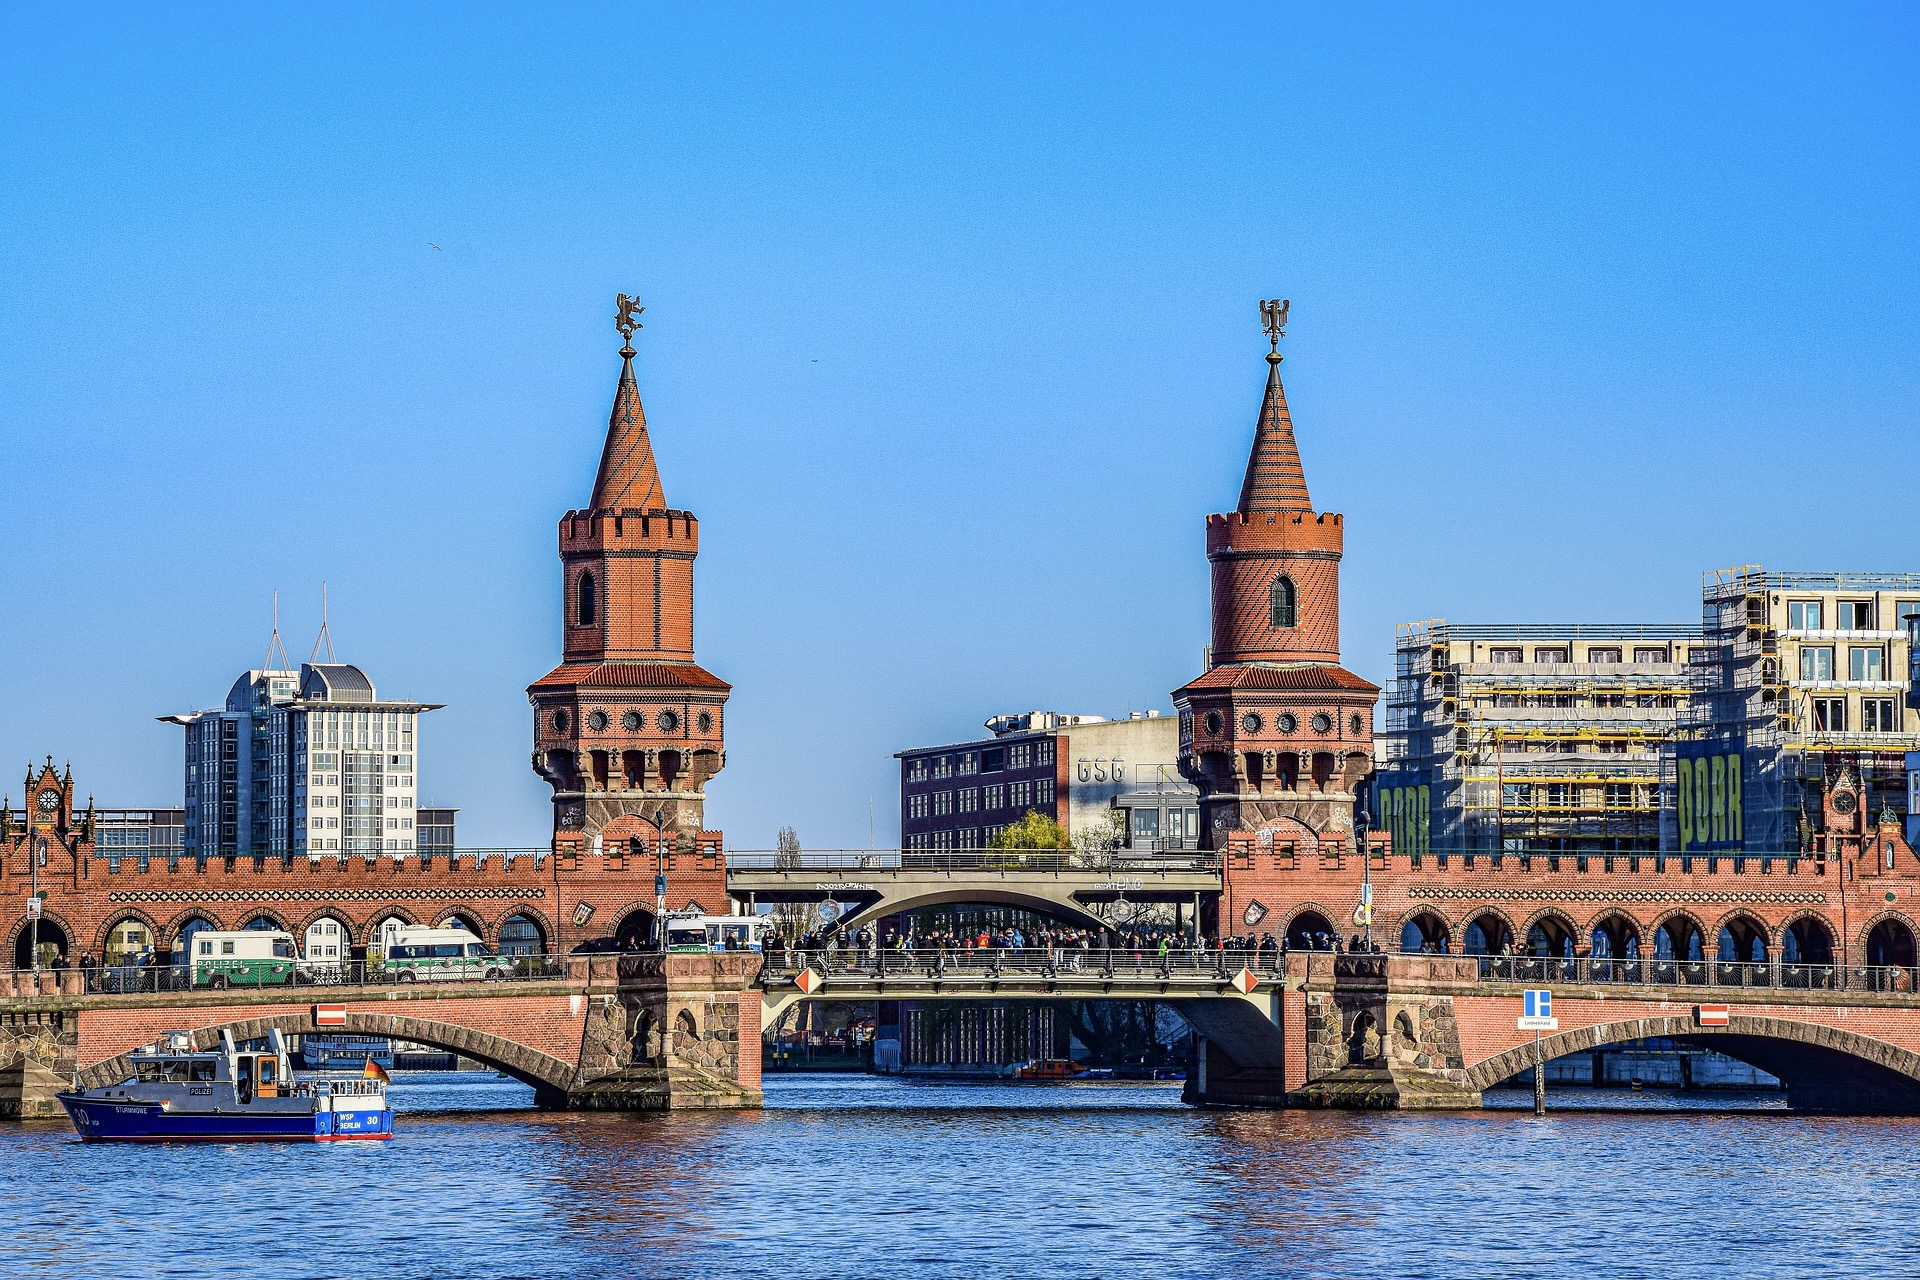 Oberbaumbrücke in Berlin Friedrichshain